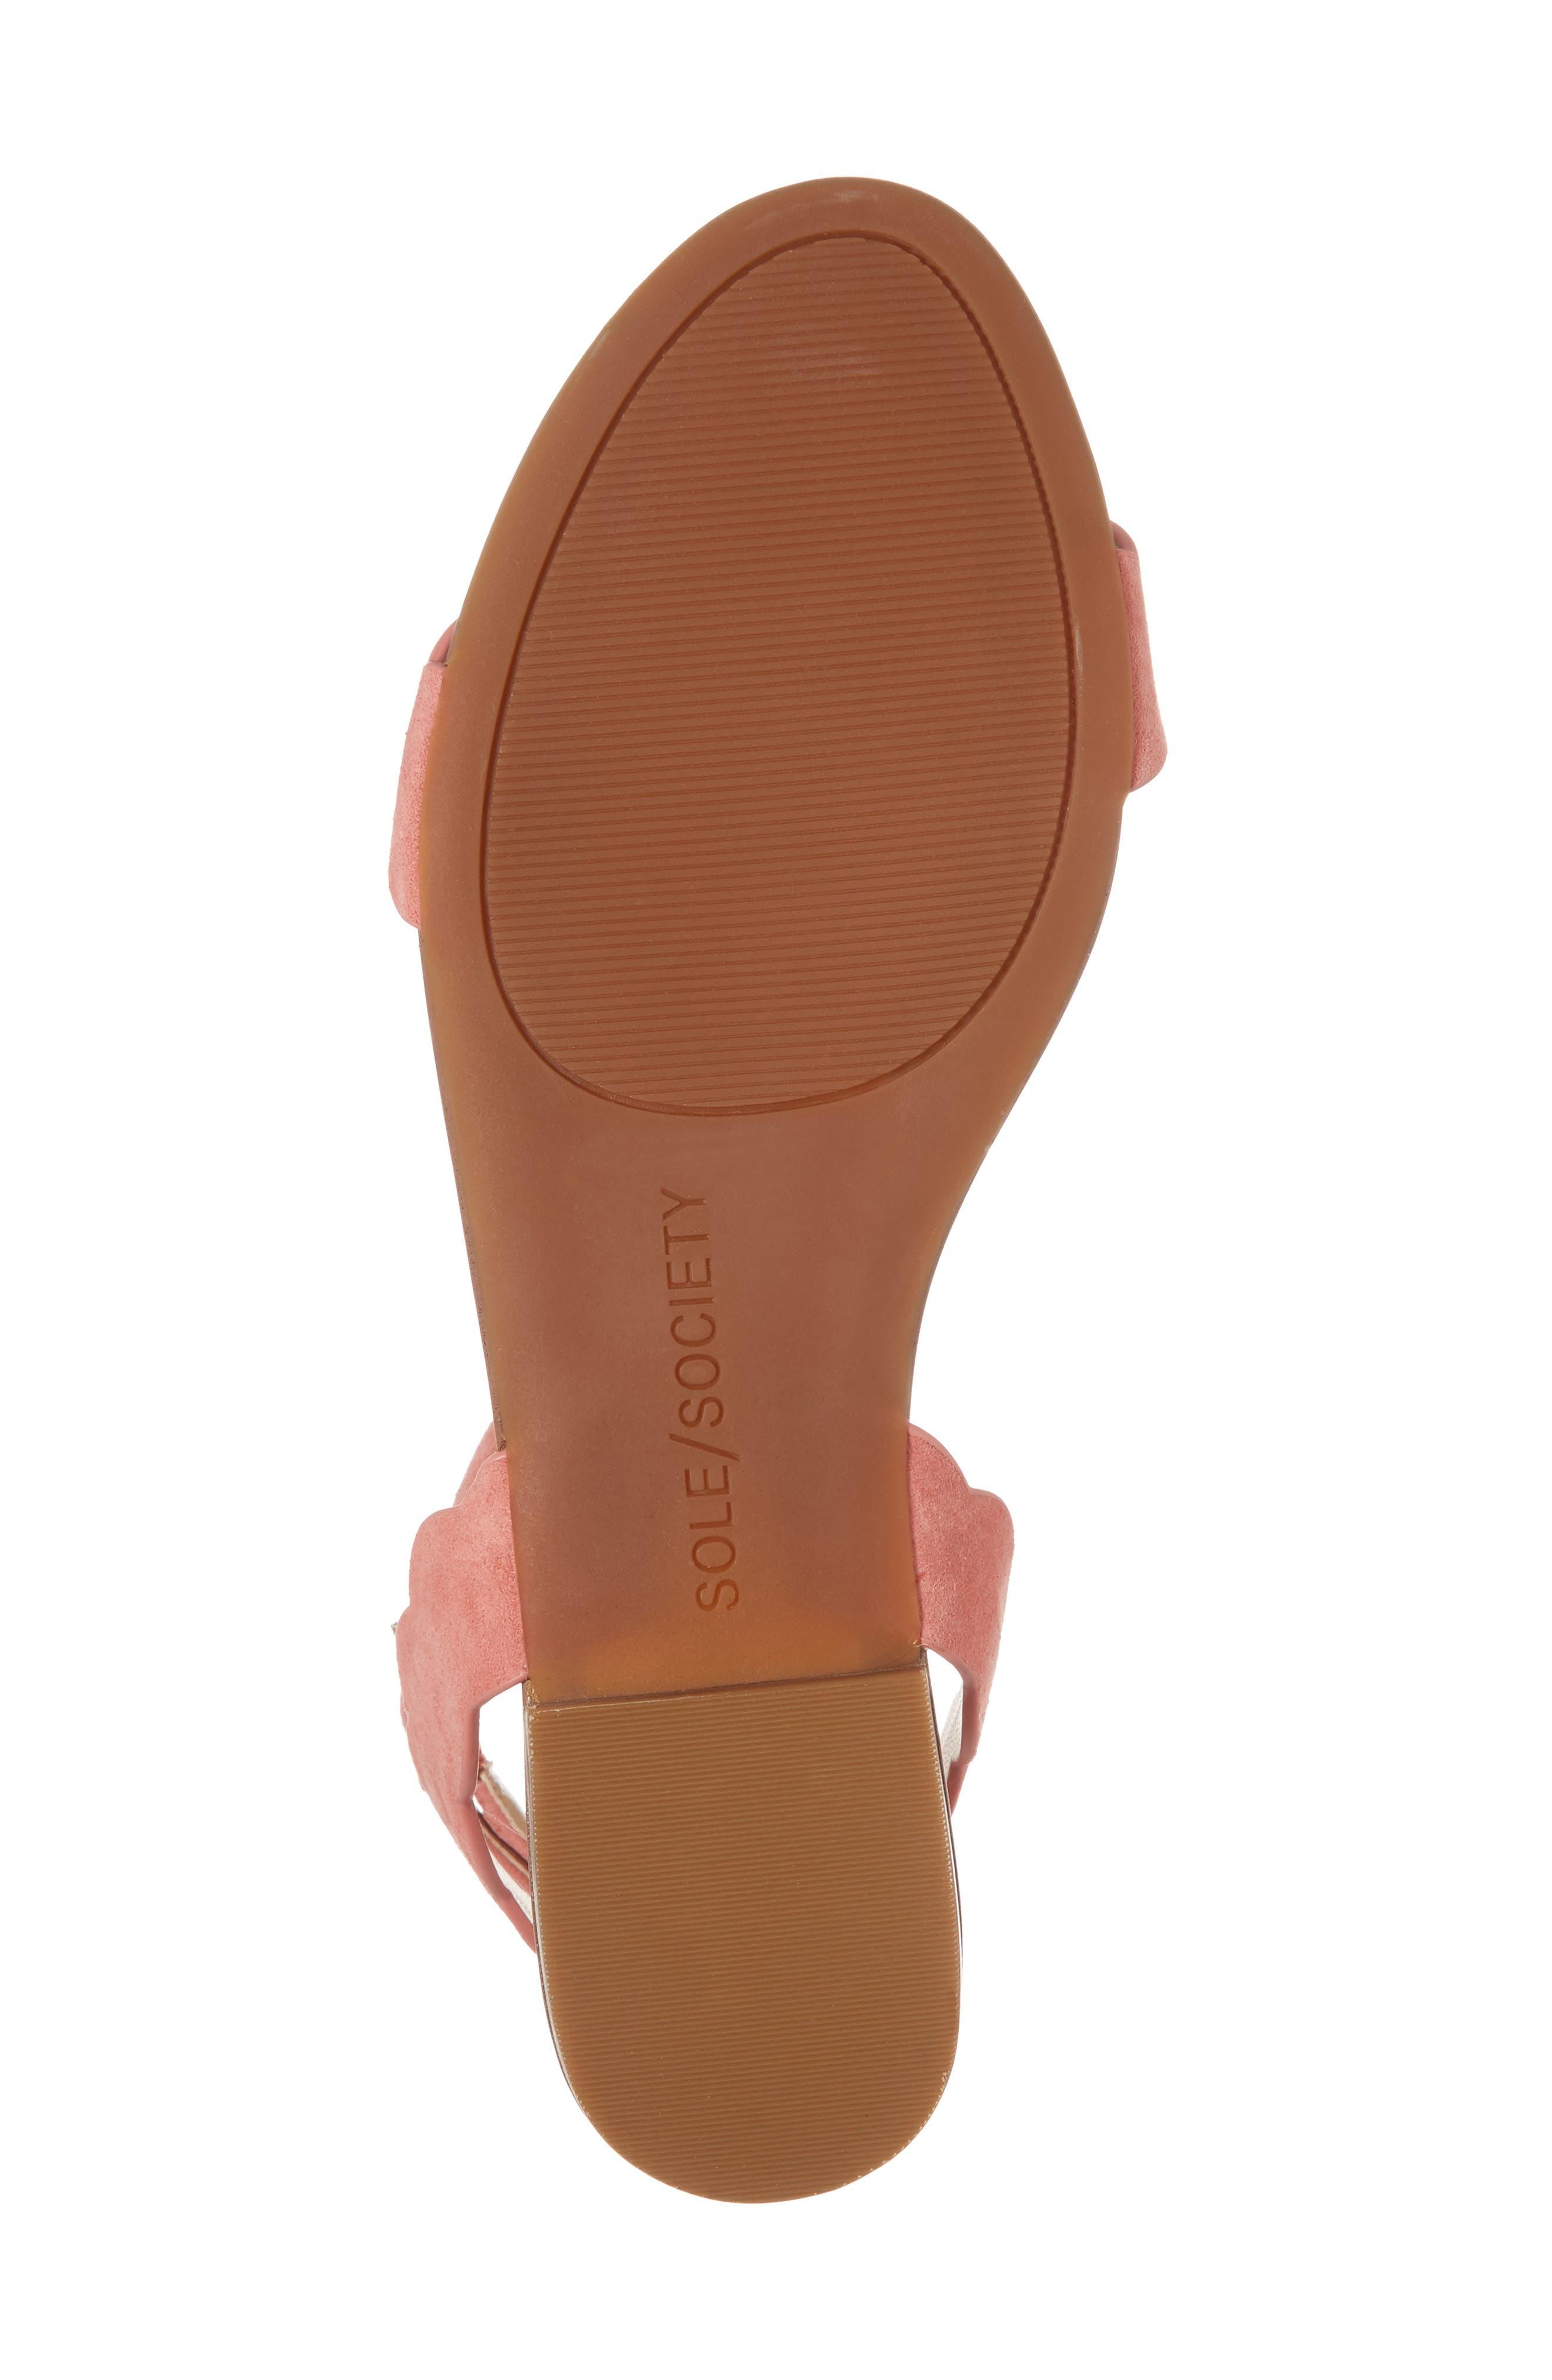 'Odette' Scalloped Ankle Strap Flat Sandal,                             Alternate thumbnail 33, color,